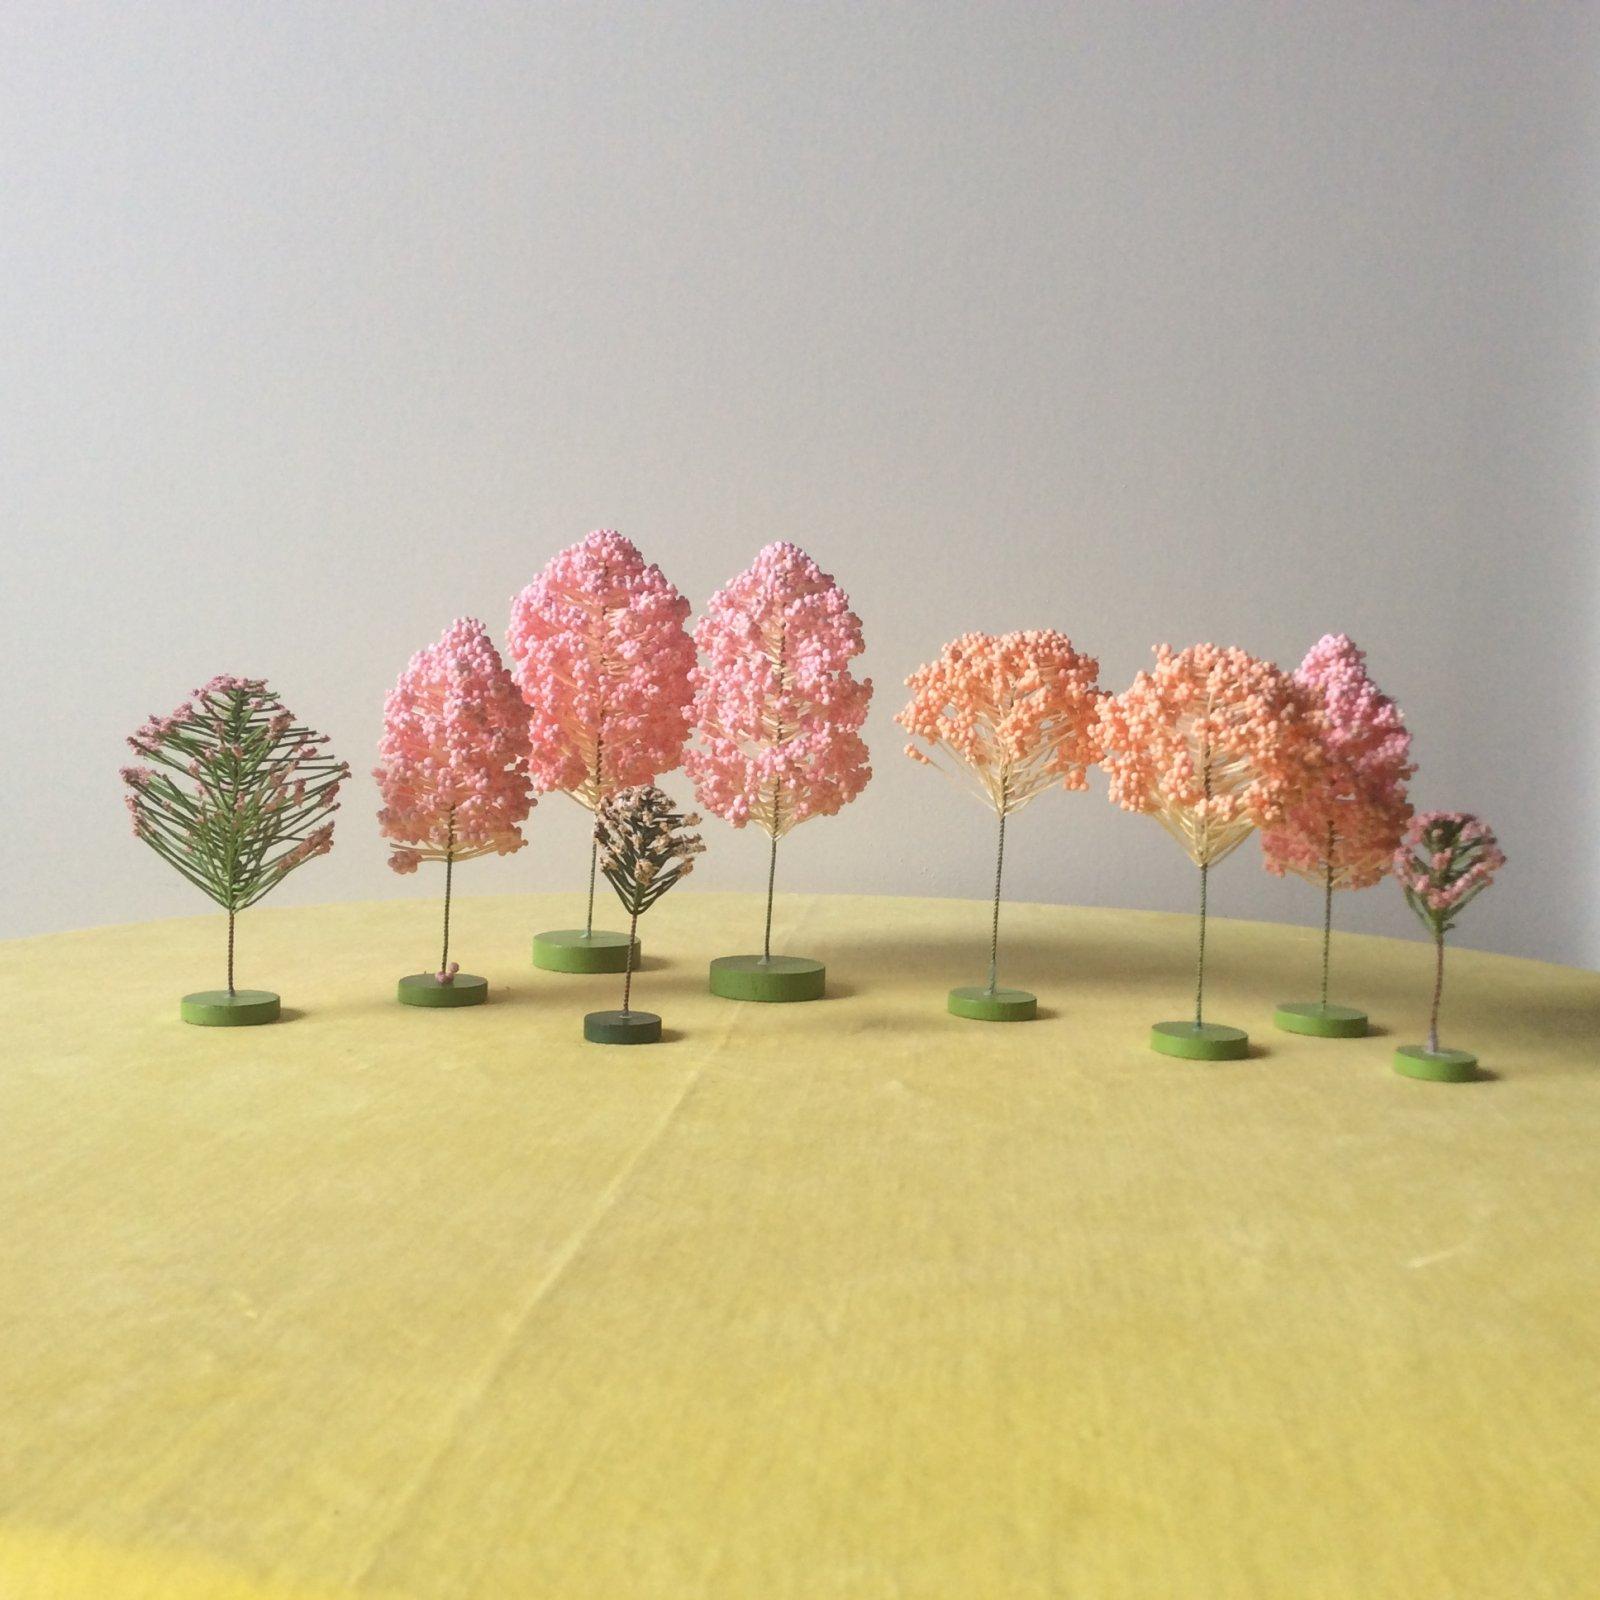 Vintage Department 56 Hide-A-Way Hollow Pastel Garden Trees Table Scape Miniature Set of Styrofoam Decorative Wire Branches VTG009